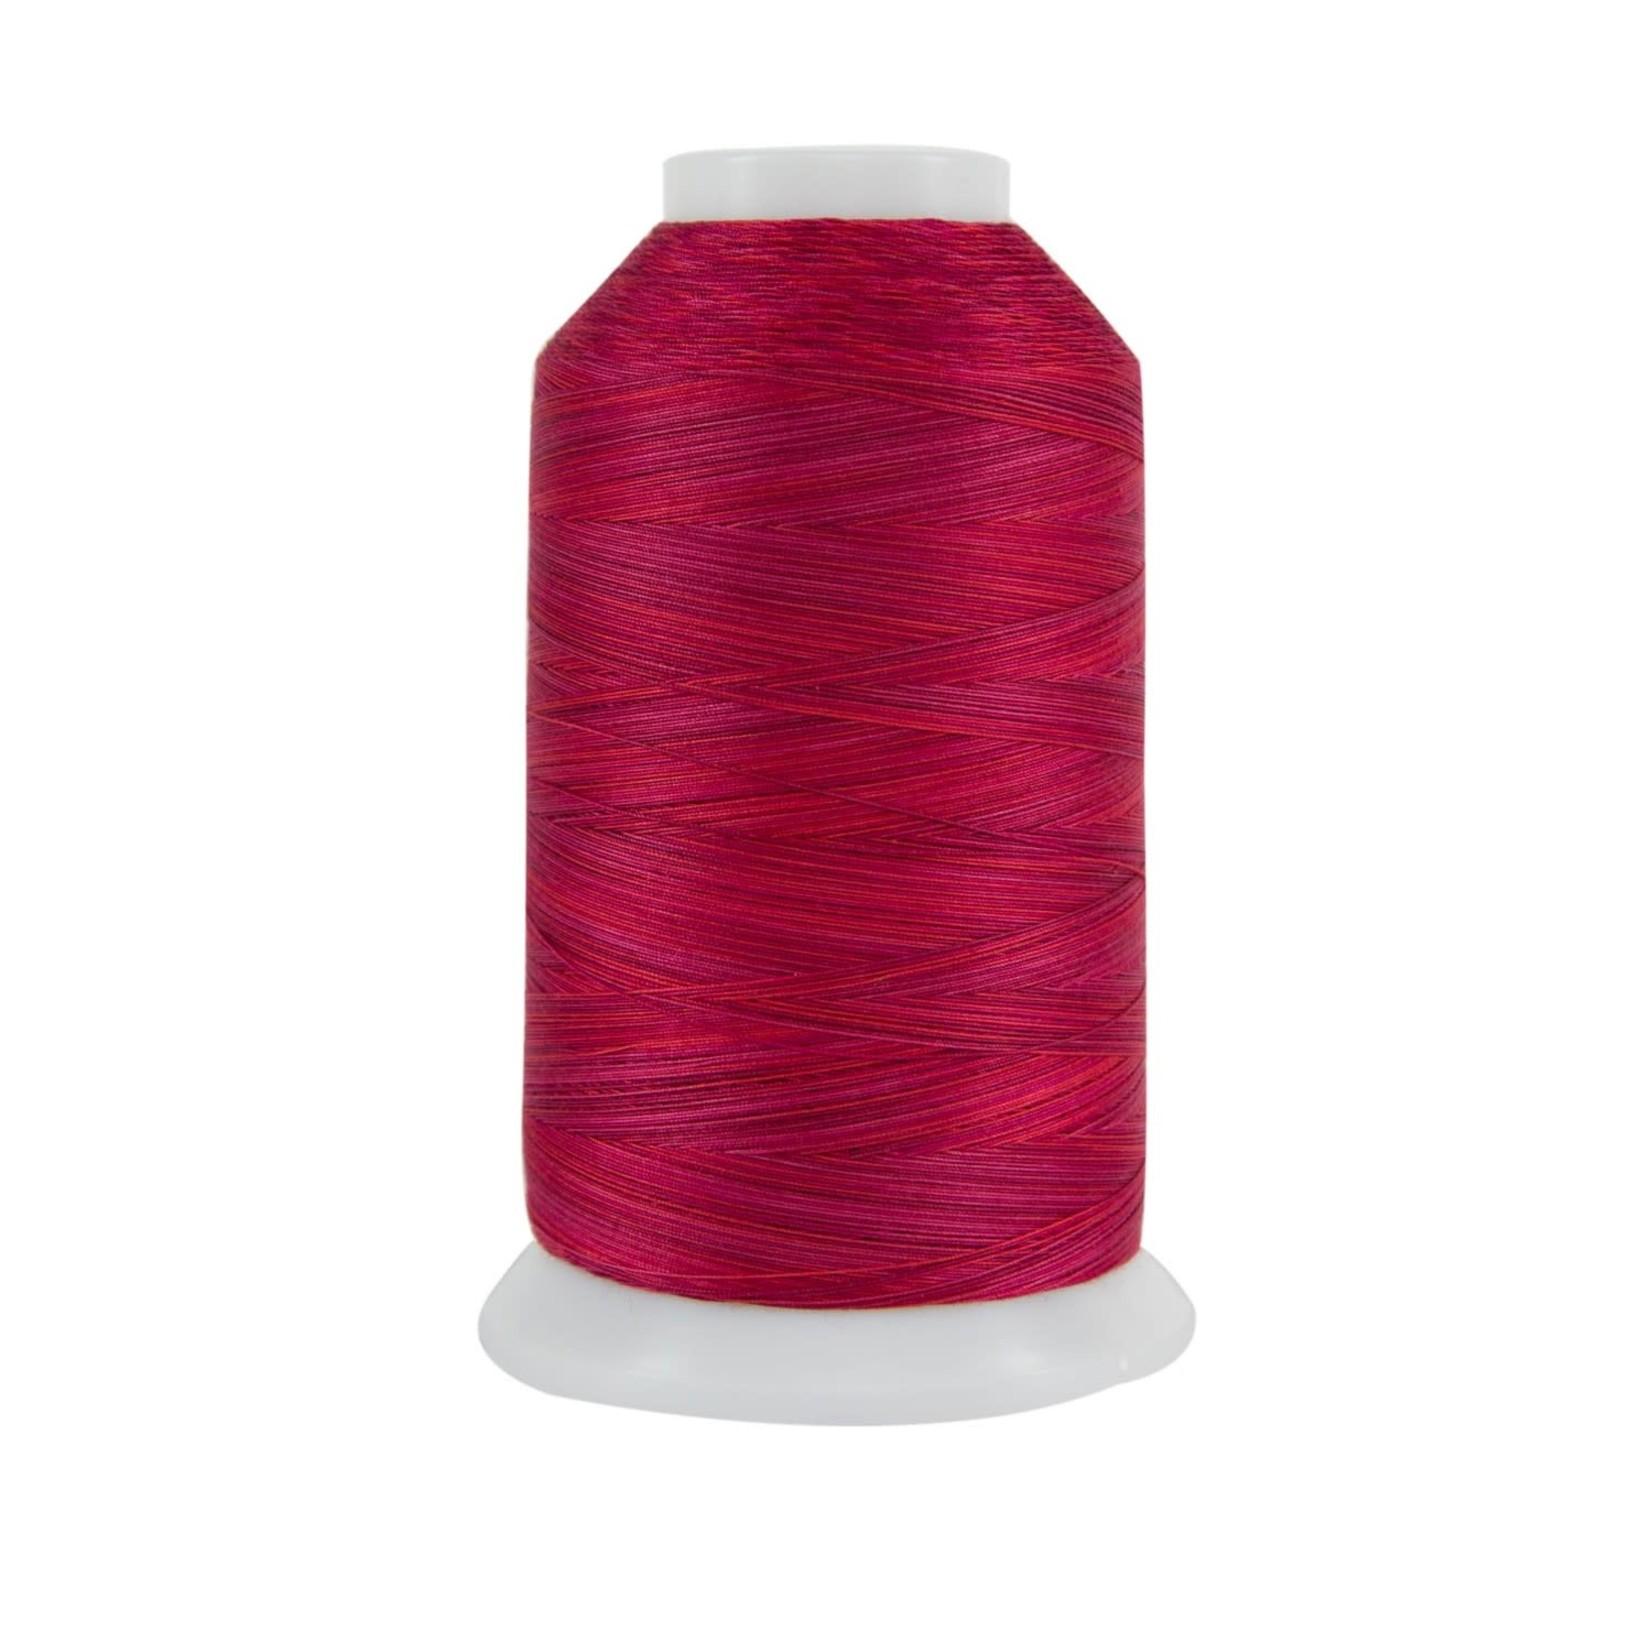 Superior Threads King Tut - #40 - 1828 m - 0946 Rubiyah